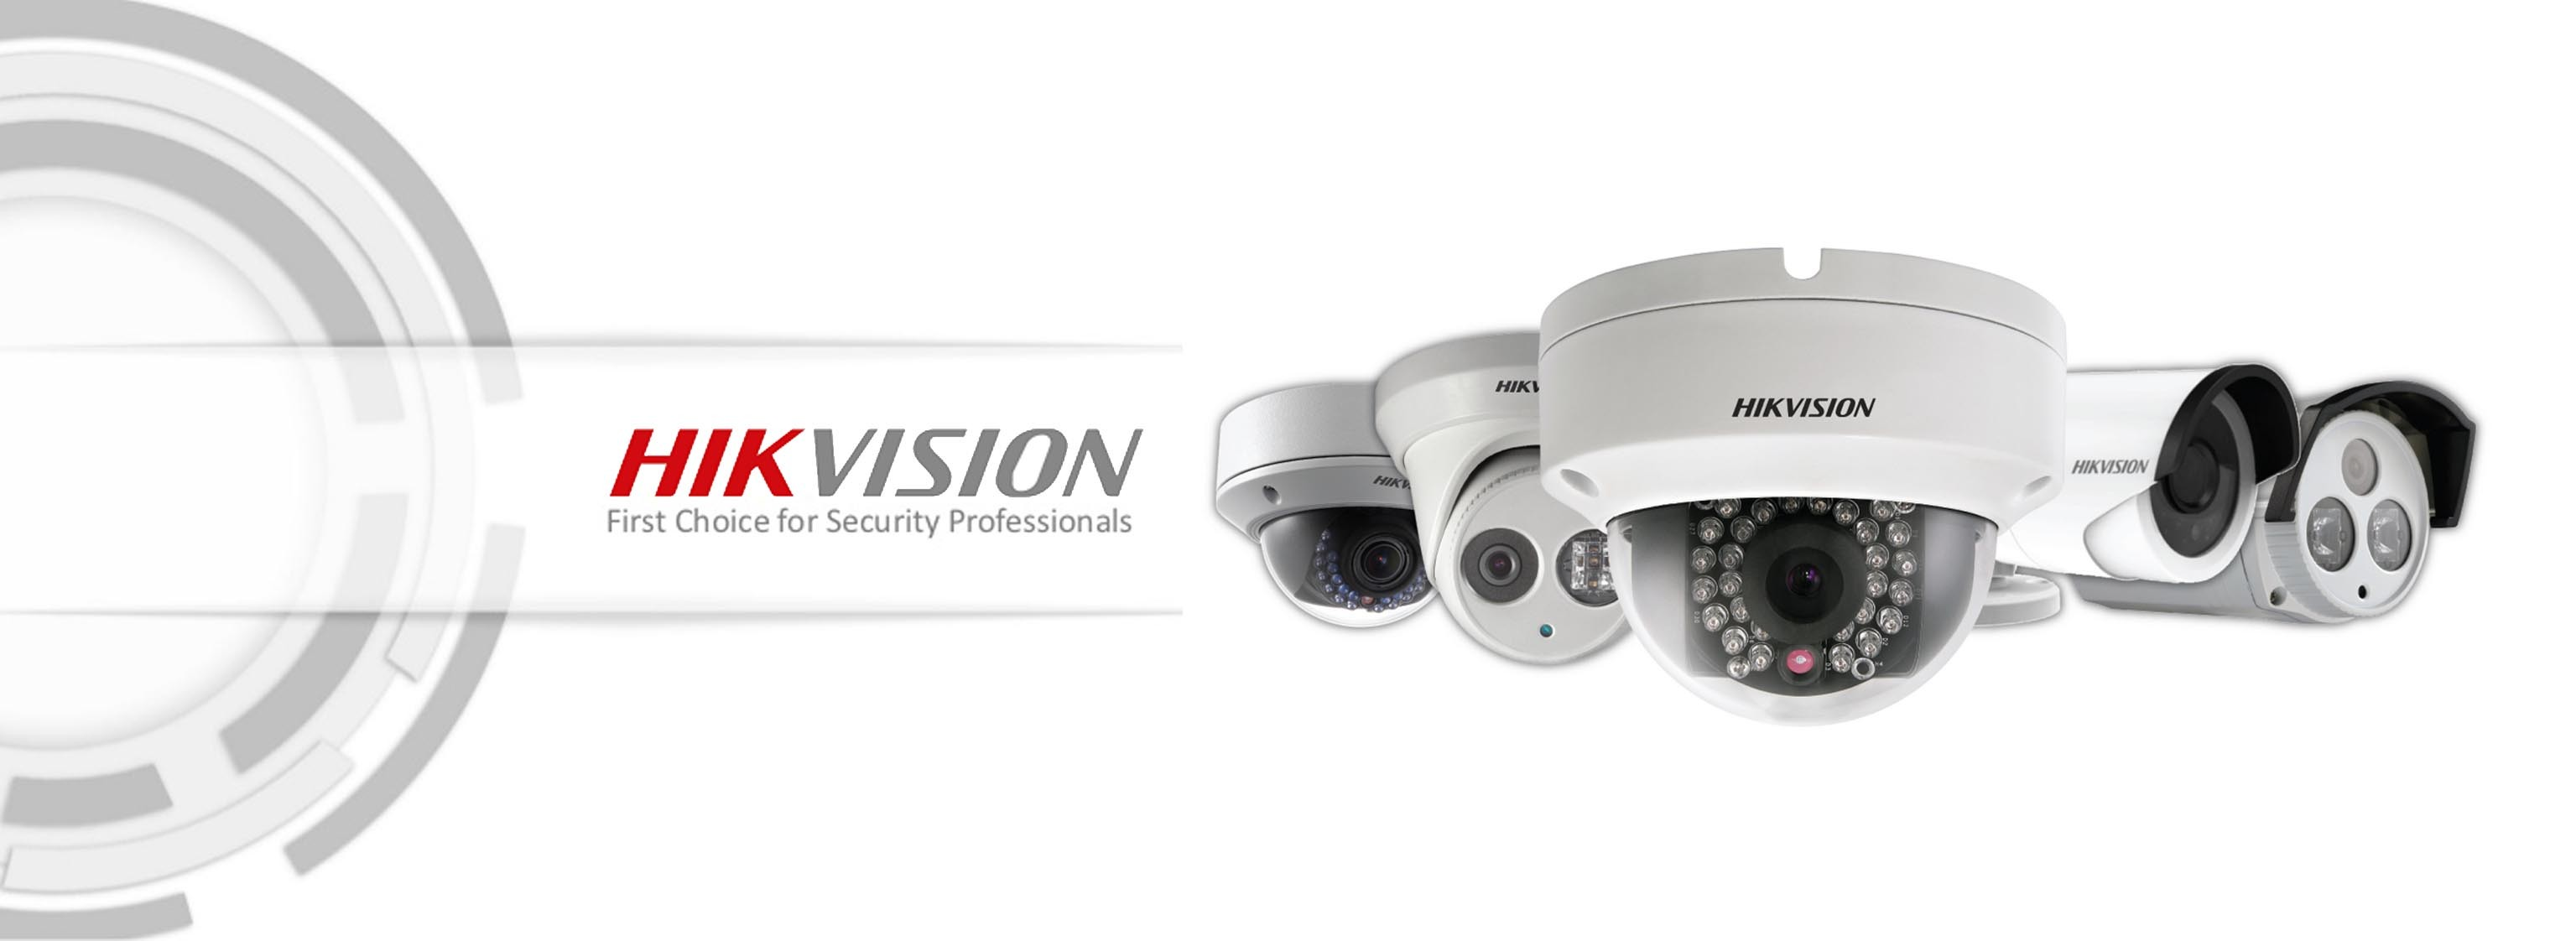 HIKVISION_CCTV_CAMERA_DUBAI